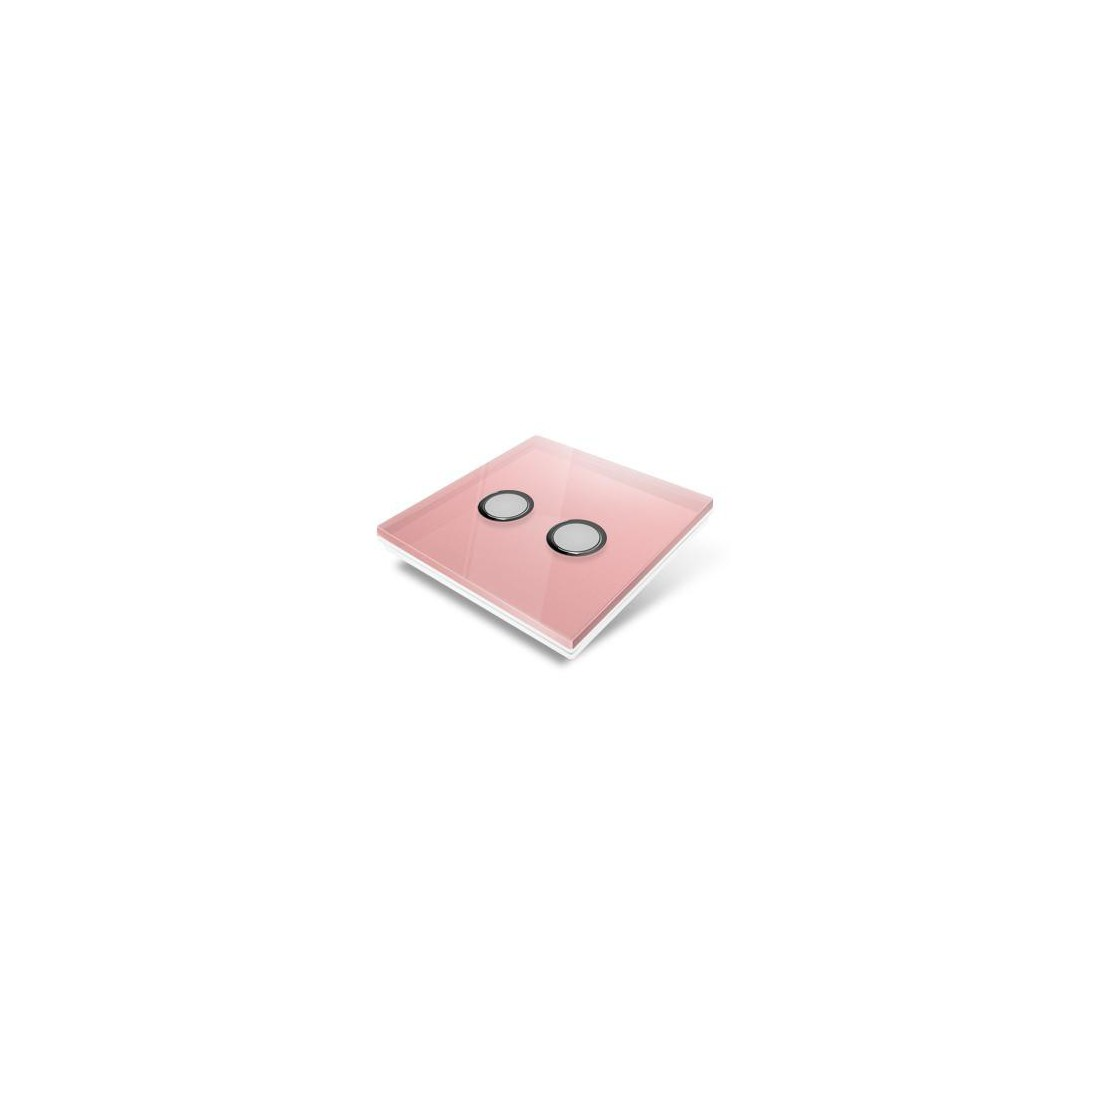 Tampa de cobertura para interruptor Edisio - cristal rosa